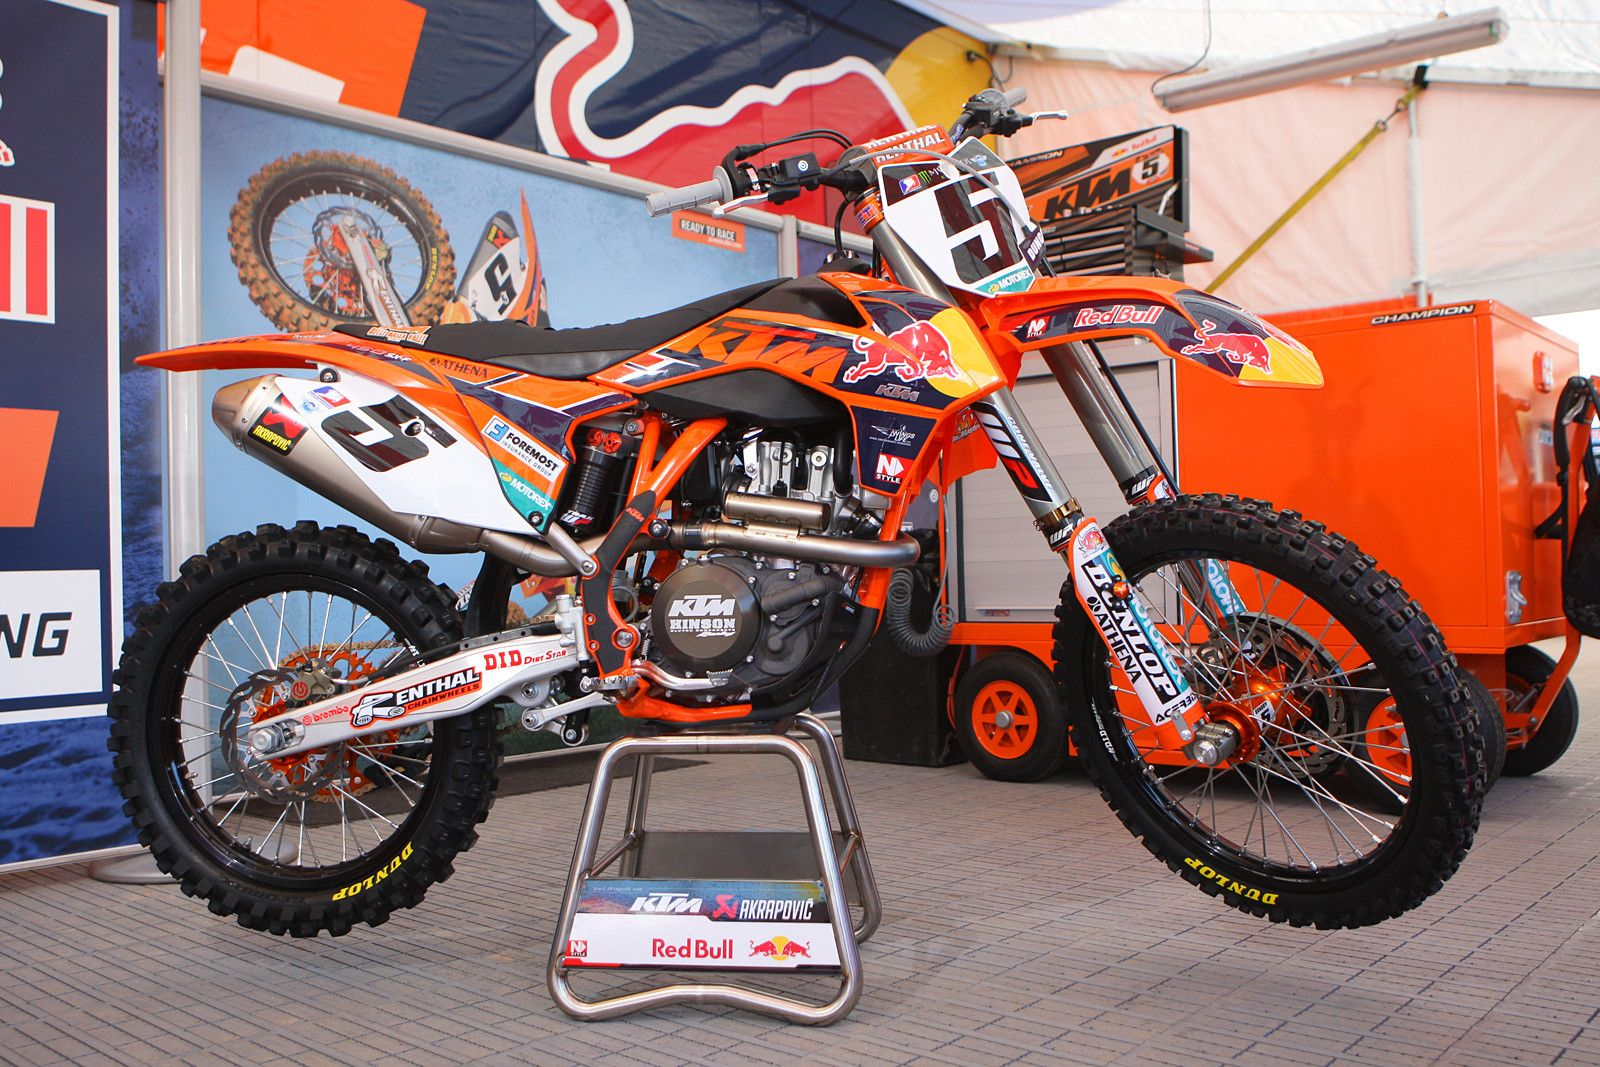 ktm sx f 450 team red bull ktm ryan dungey supercross 2013 motocroa pinterest. Black Bedroom Furniture Sets. Home Design Ideas